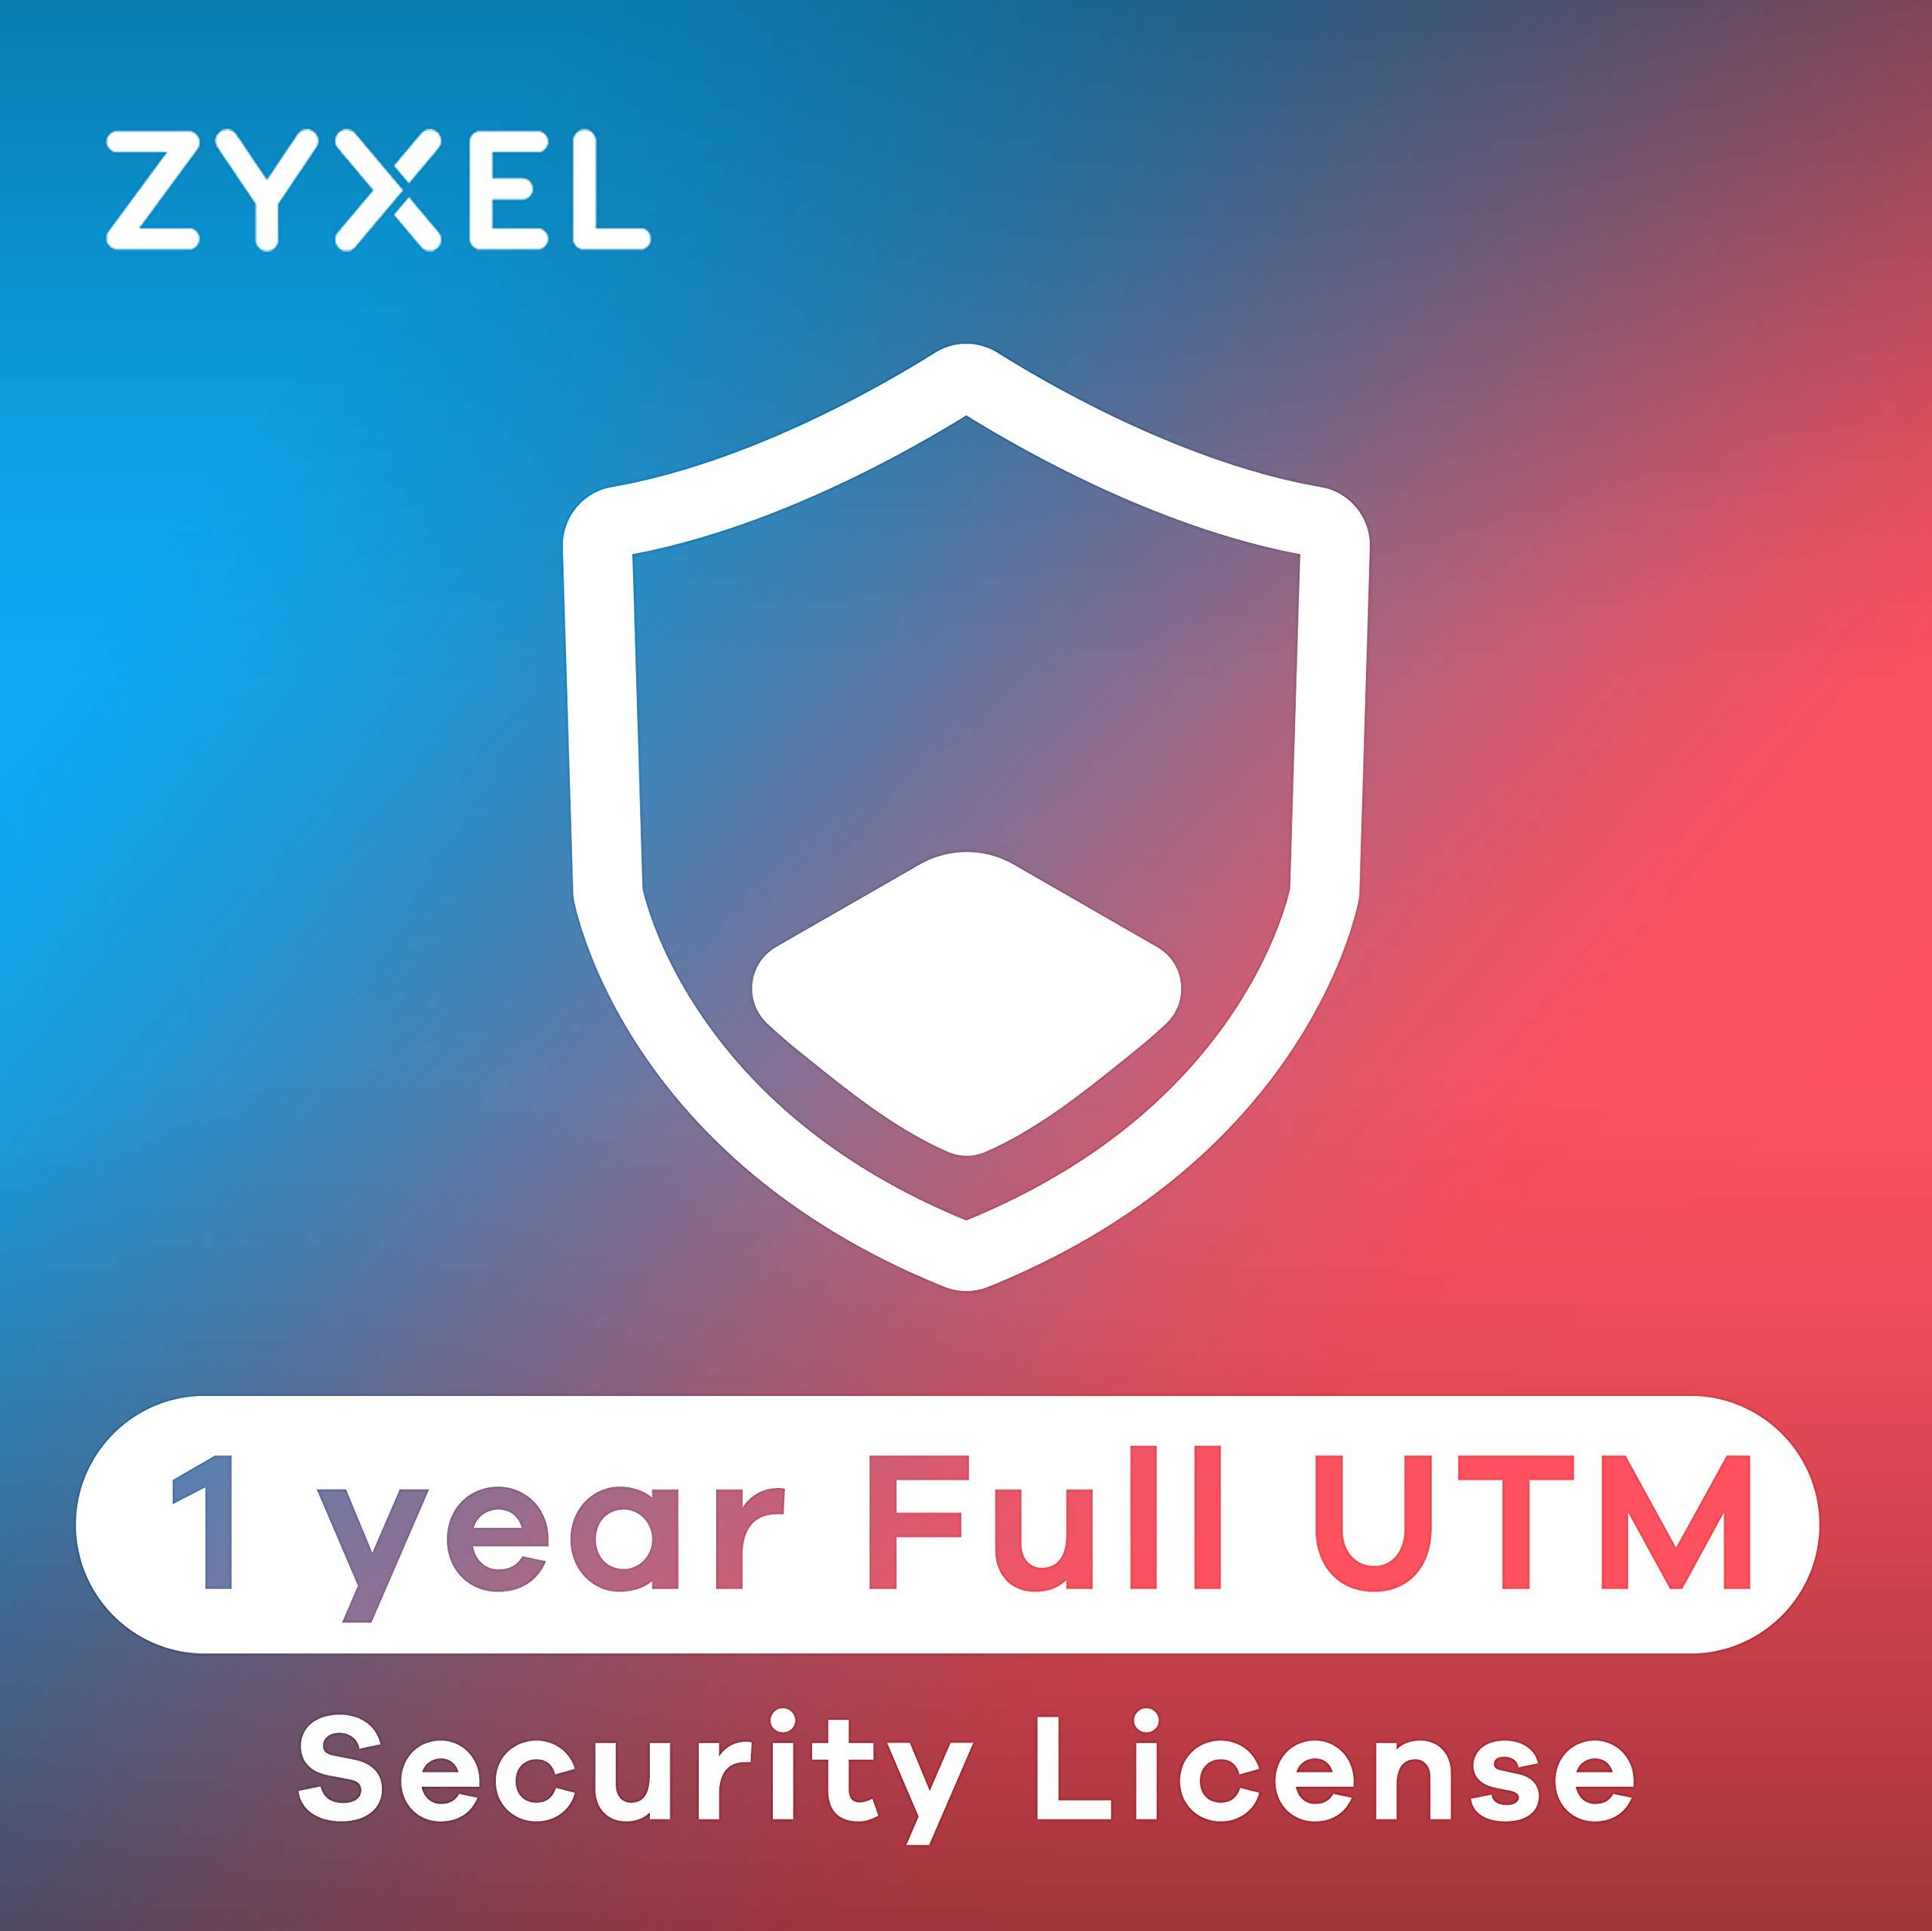 ZyXEL UTM Licencia, 1 YR Content Filtering, Anti-Spam, Anti-Virus Bitdefender Signature, IDP para USG40/USG40W [LIC-BUN-ZZ0046F]: Amazon.es: Electrónica